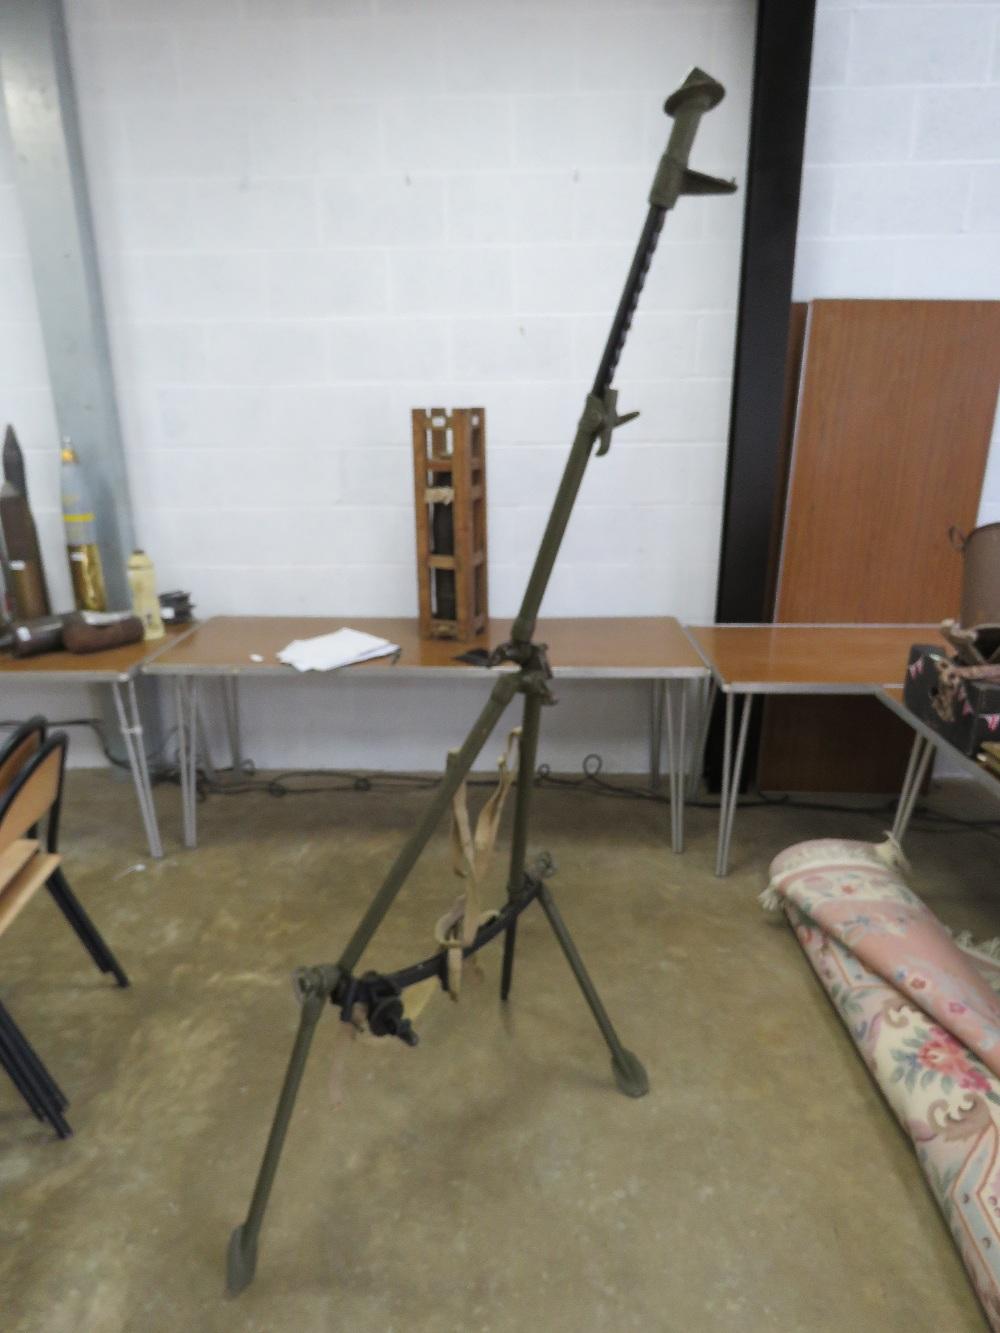 Lot 50 - A WWII British Bren gun having carry str